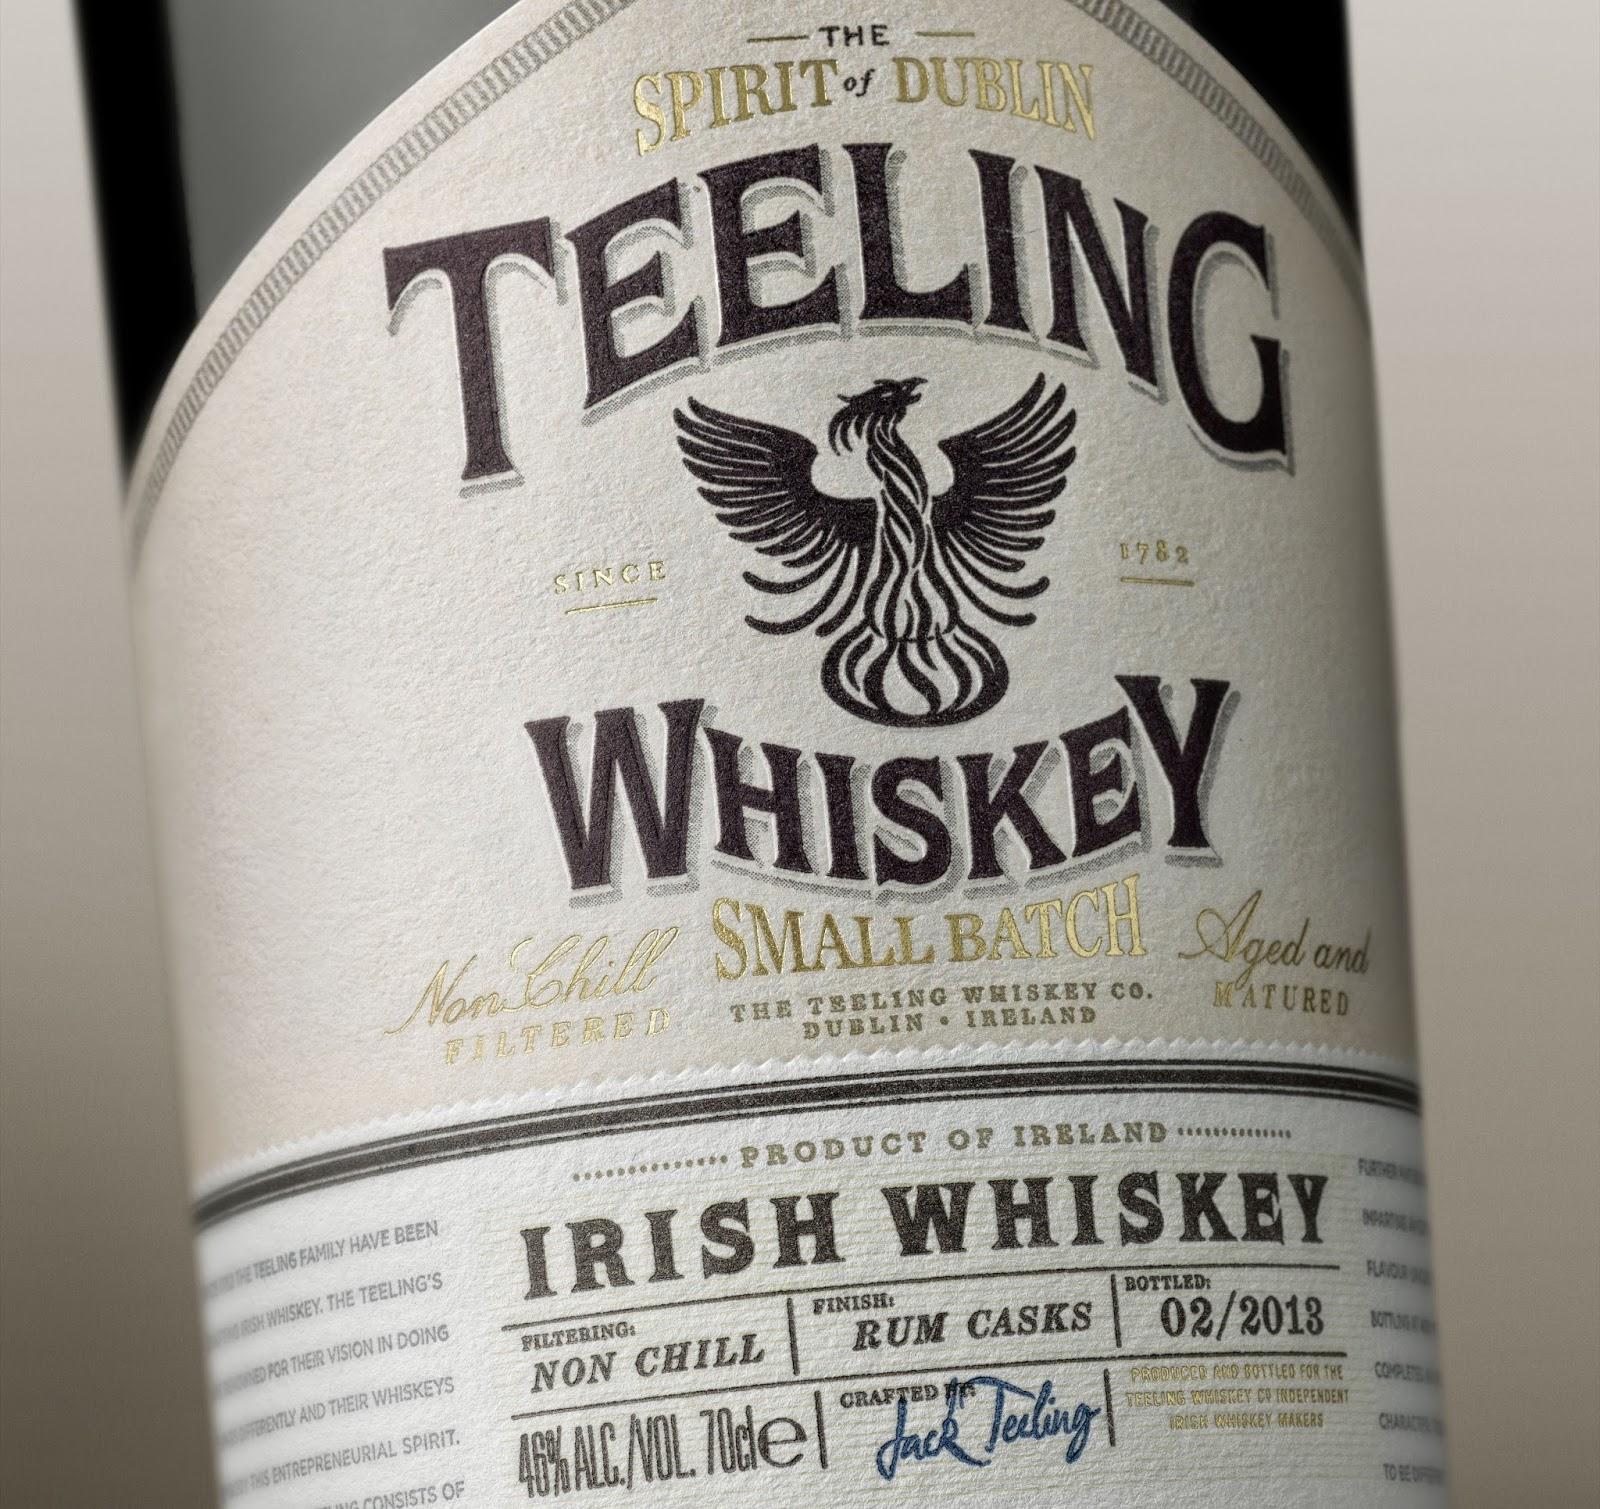 Bottiglia di Whisky Teeling